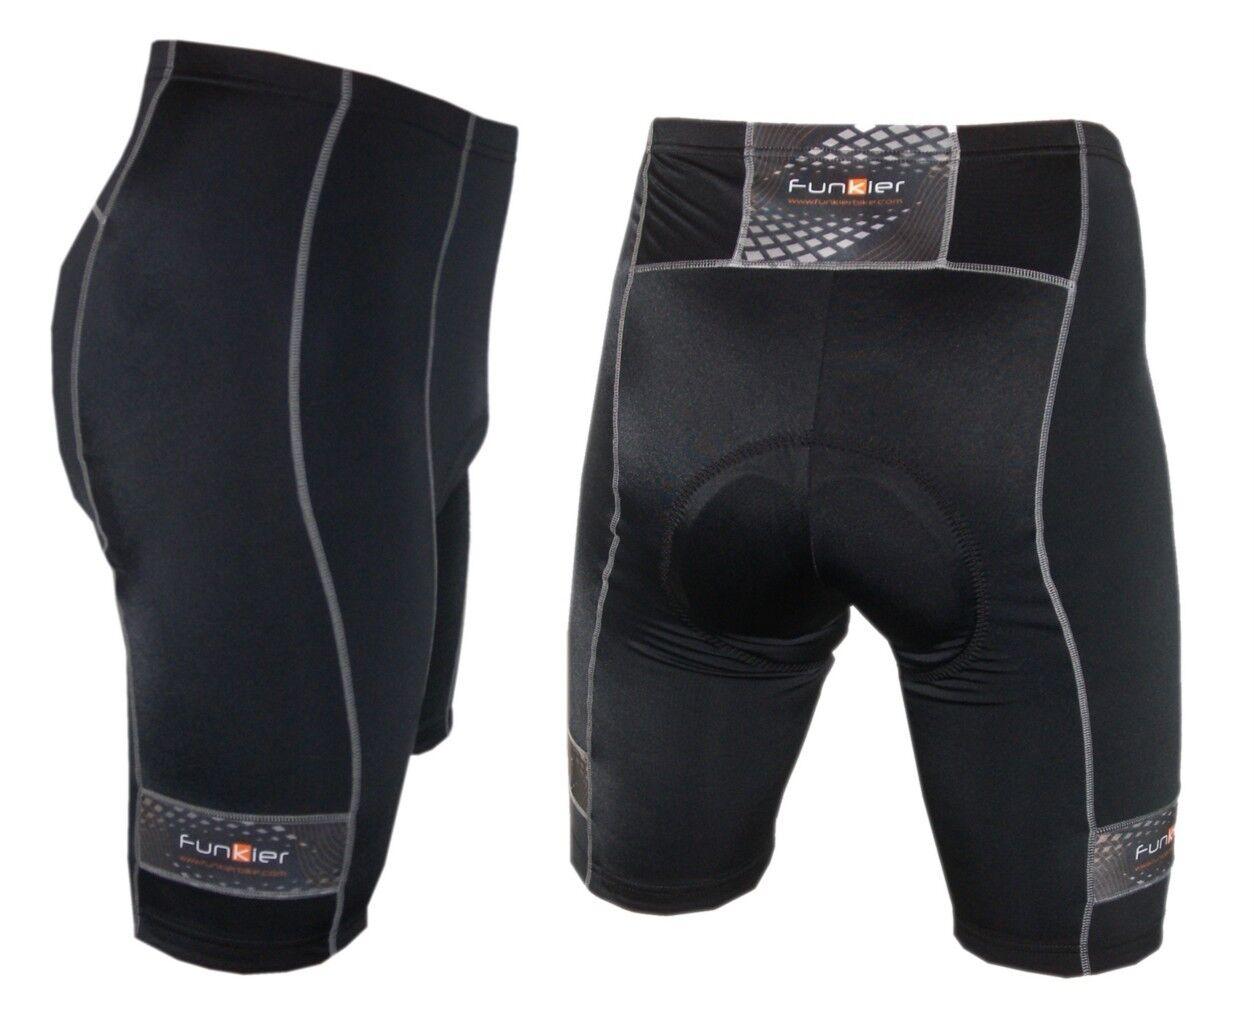 Funkier Men's Cycling Shorts  S-203-C1 , 9 Panel Men's cycling shorts  guaranteed